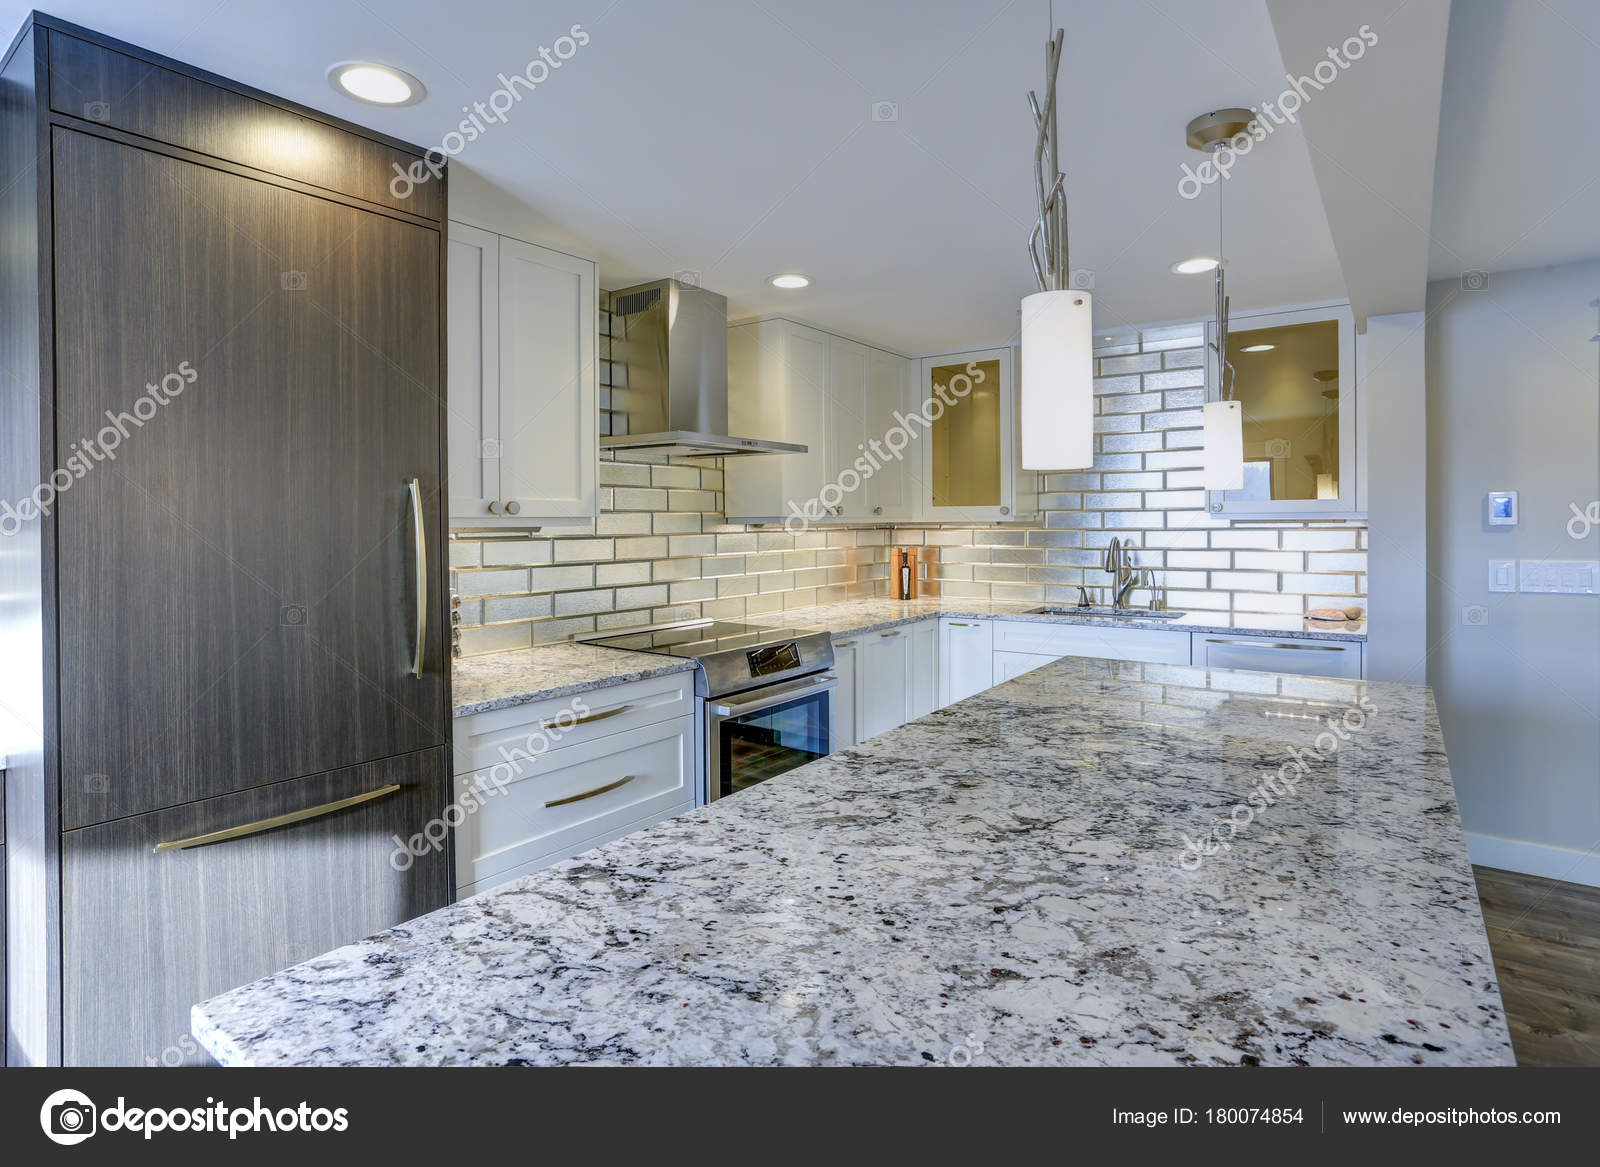 kitchen island tops cabinets mn 现代厨房房在公寓的家 图库照片 c alabn 180074854 配备精良的厨房设有一个大的厨房岛 顶上有灰色石英石台面 银色后和白色振动筛柜 照片作者alabn